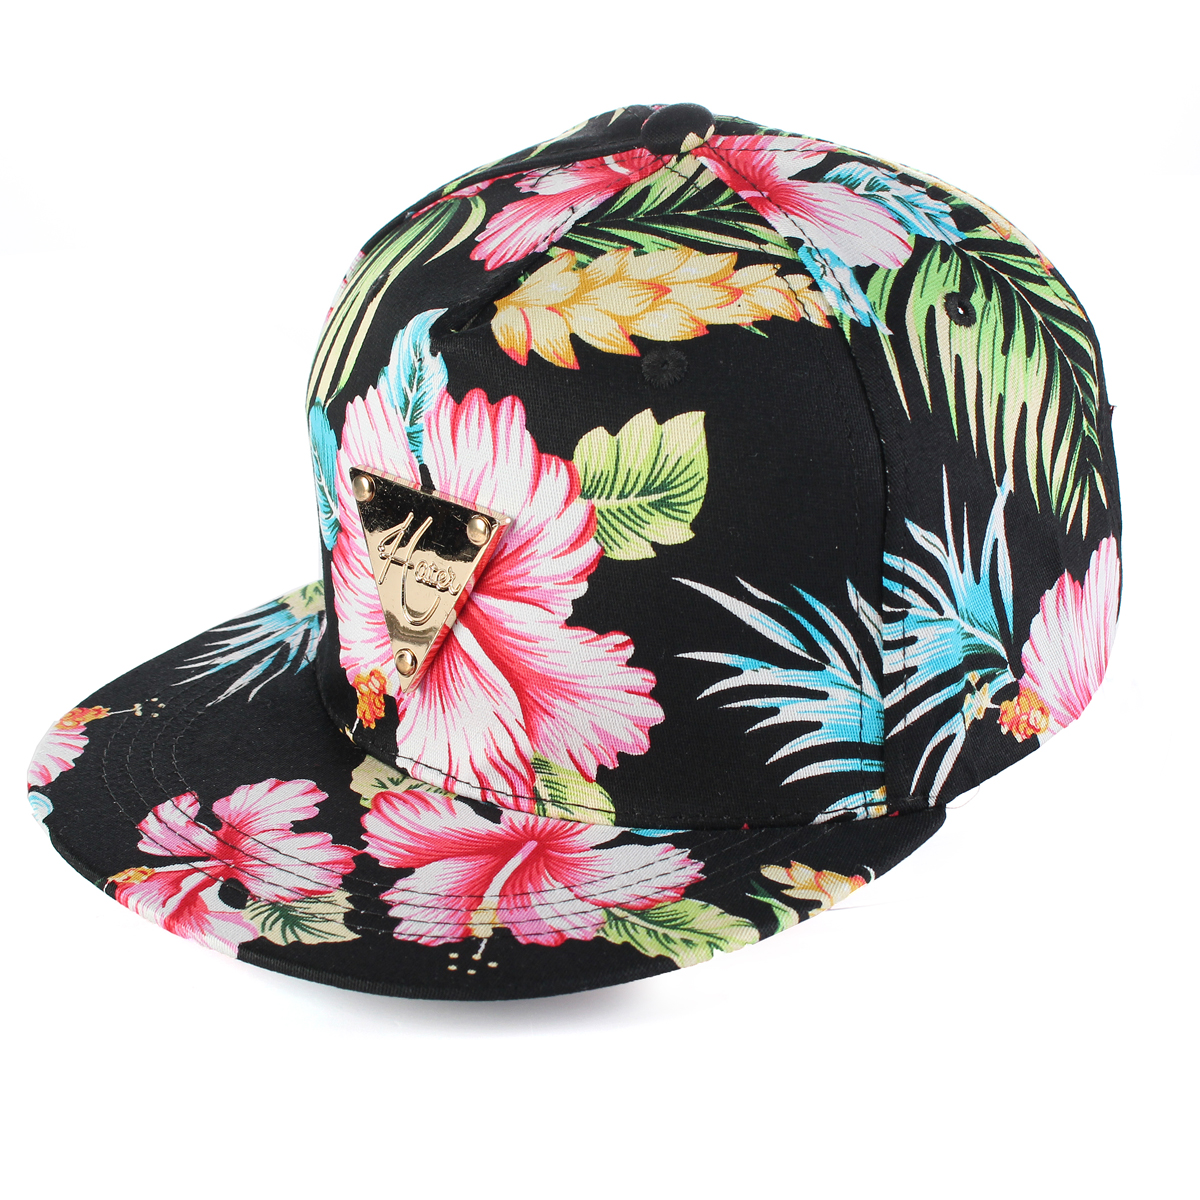 6b7d09653dd NEW Men Women Snapback Baseball Cap Hip Hop Hat Floral Letter Adjustable  Canvas